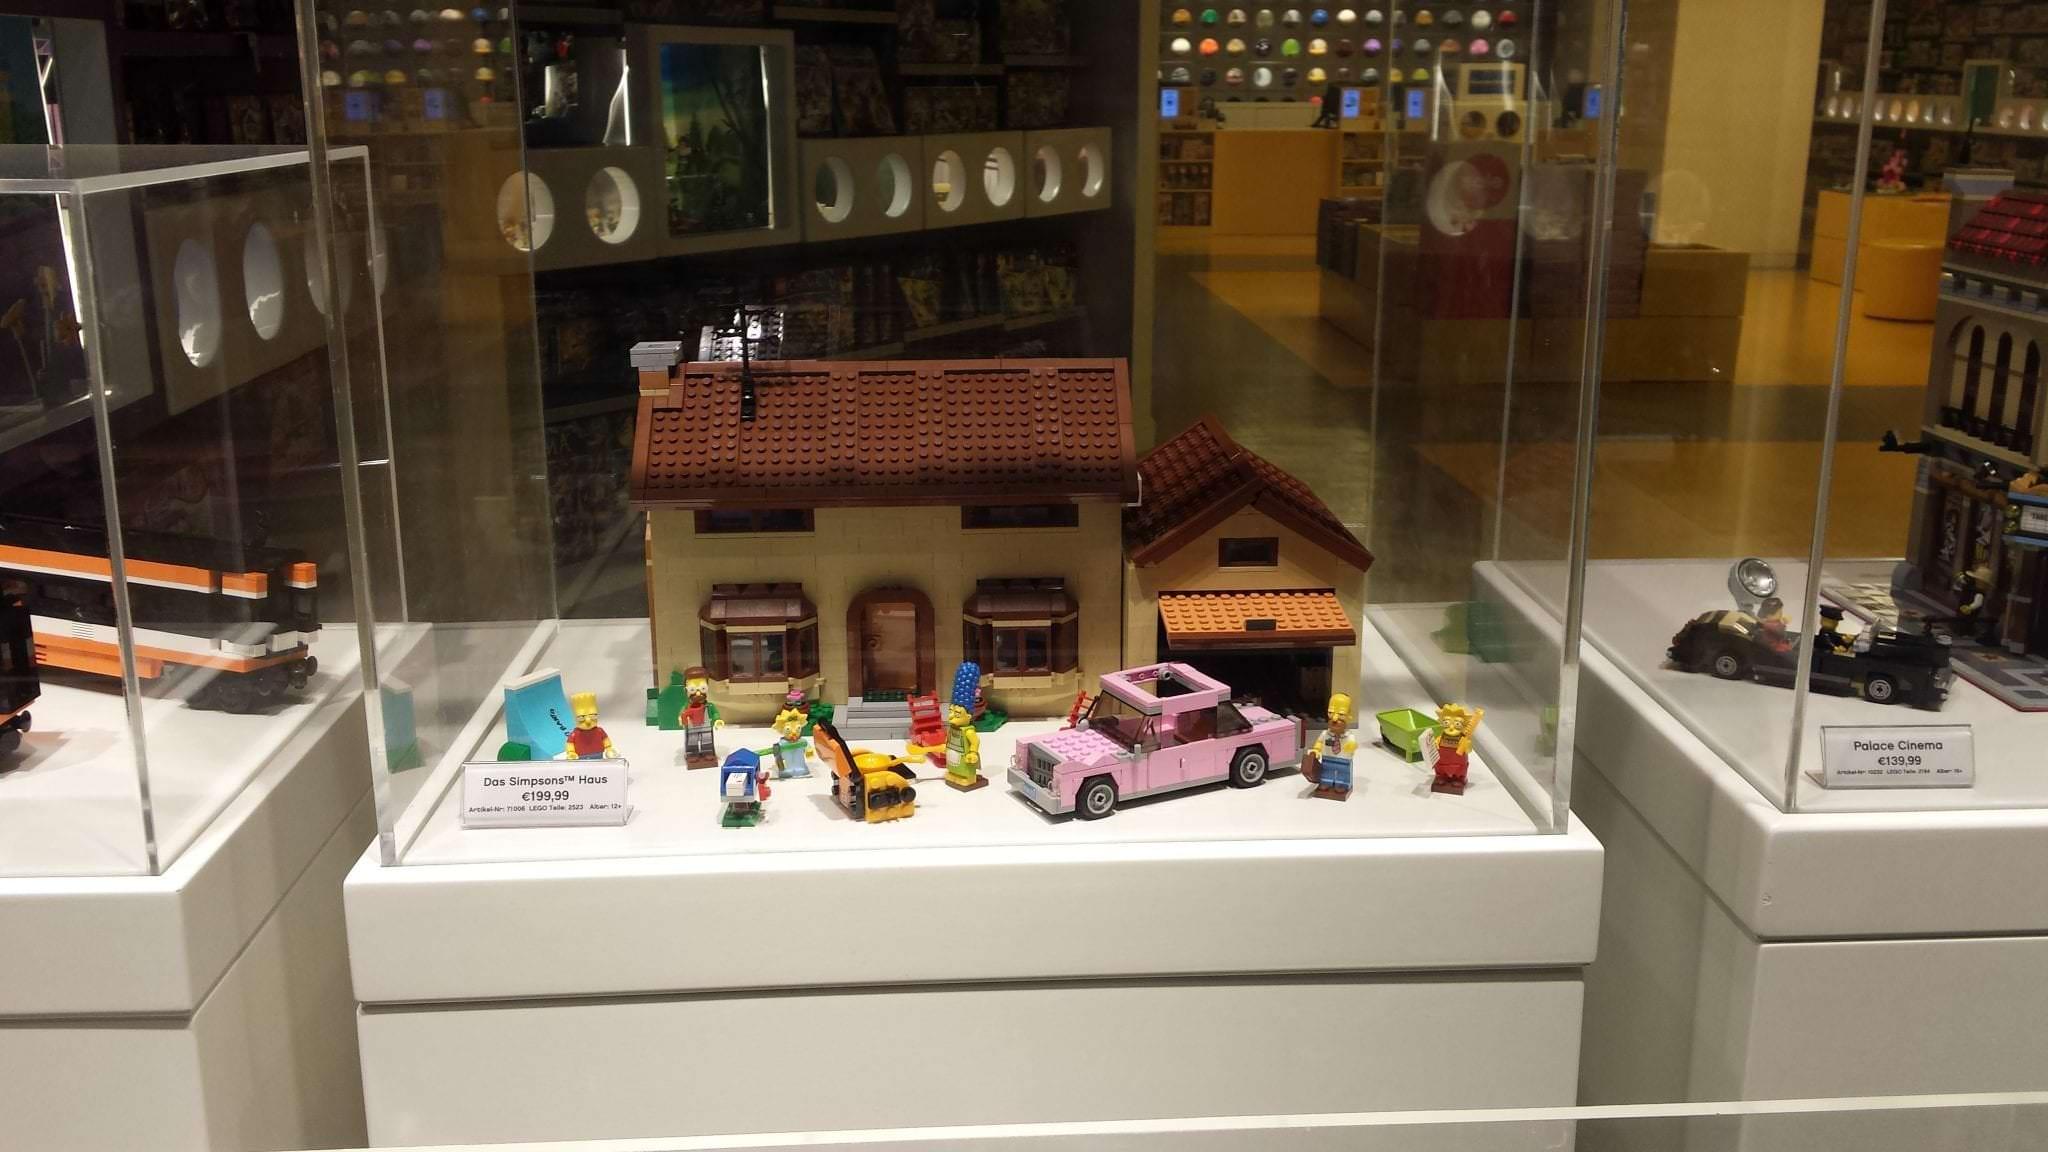 simpsons haus aus lego sinnexplosion. Black Bedroom Furniture Sets. Home Design Ideas